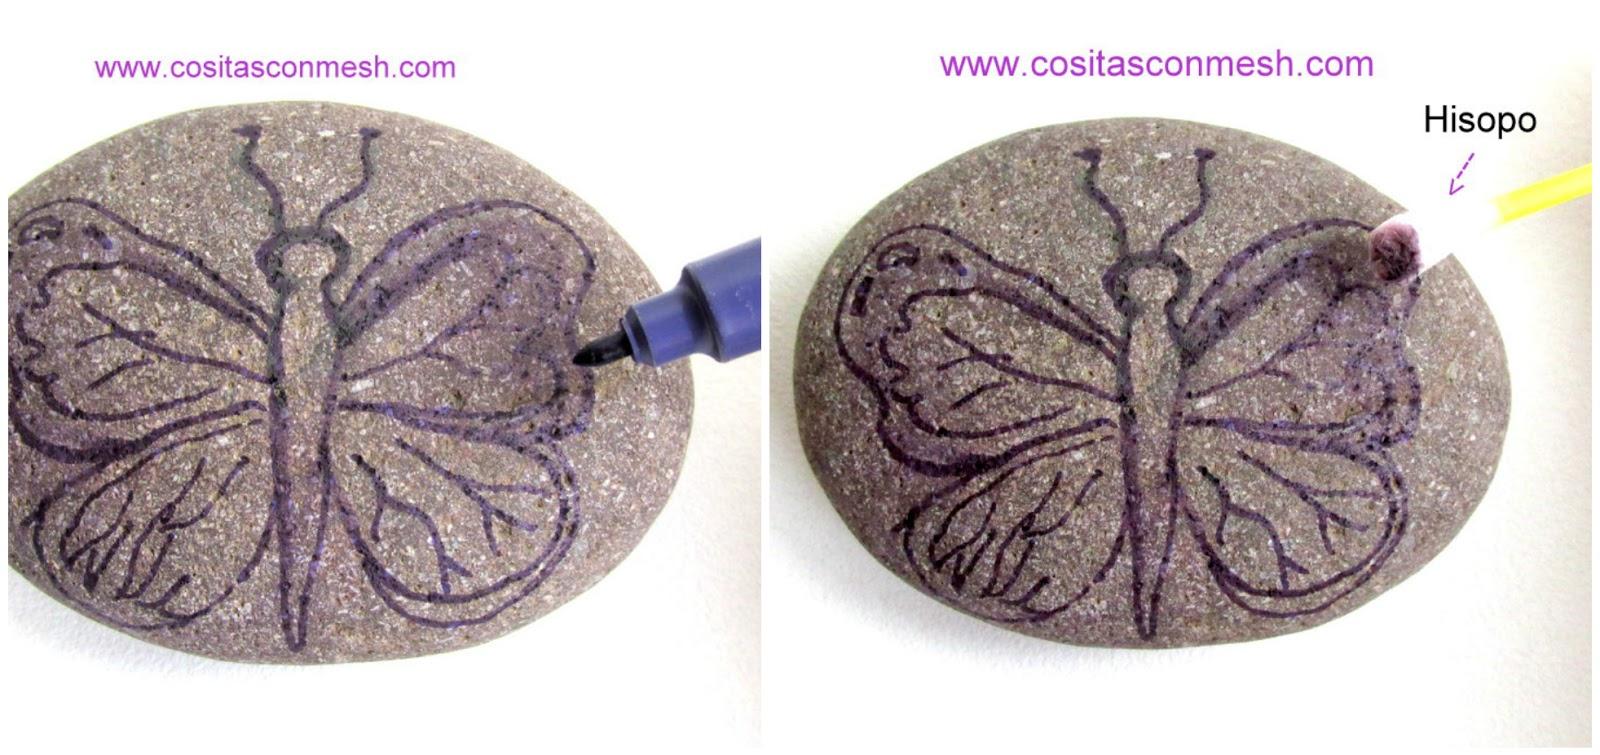 Ideas bonitas para pintar mariposas en piedras ~ cositasconmesh